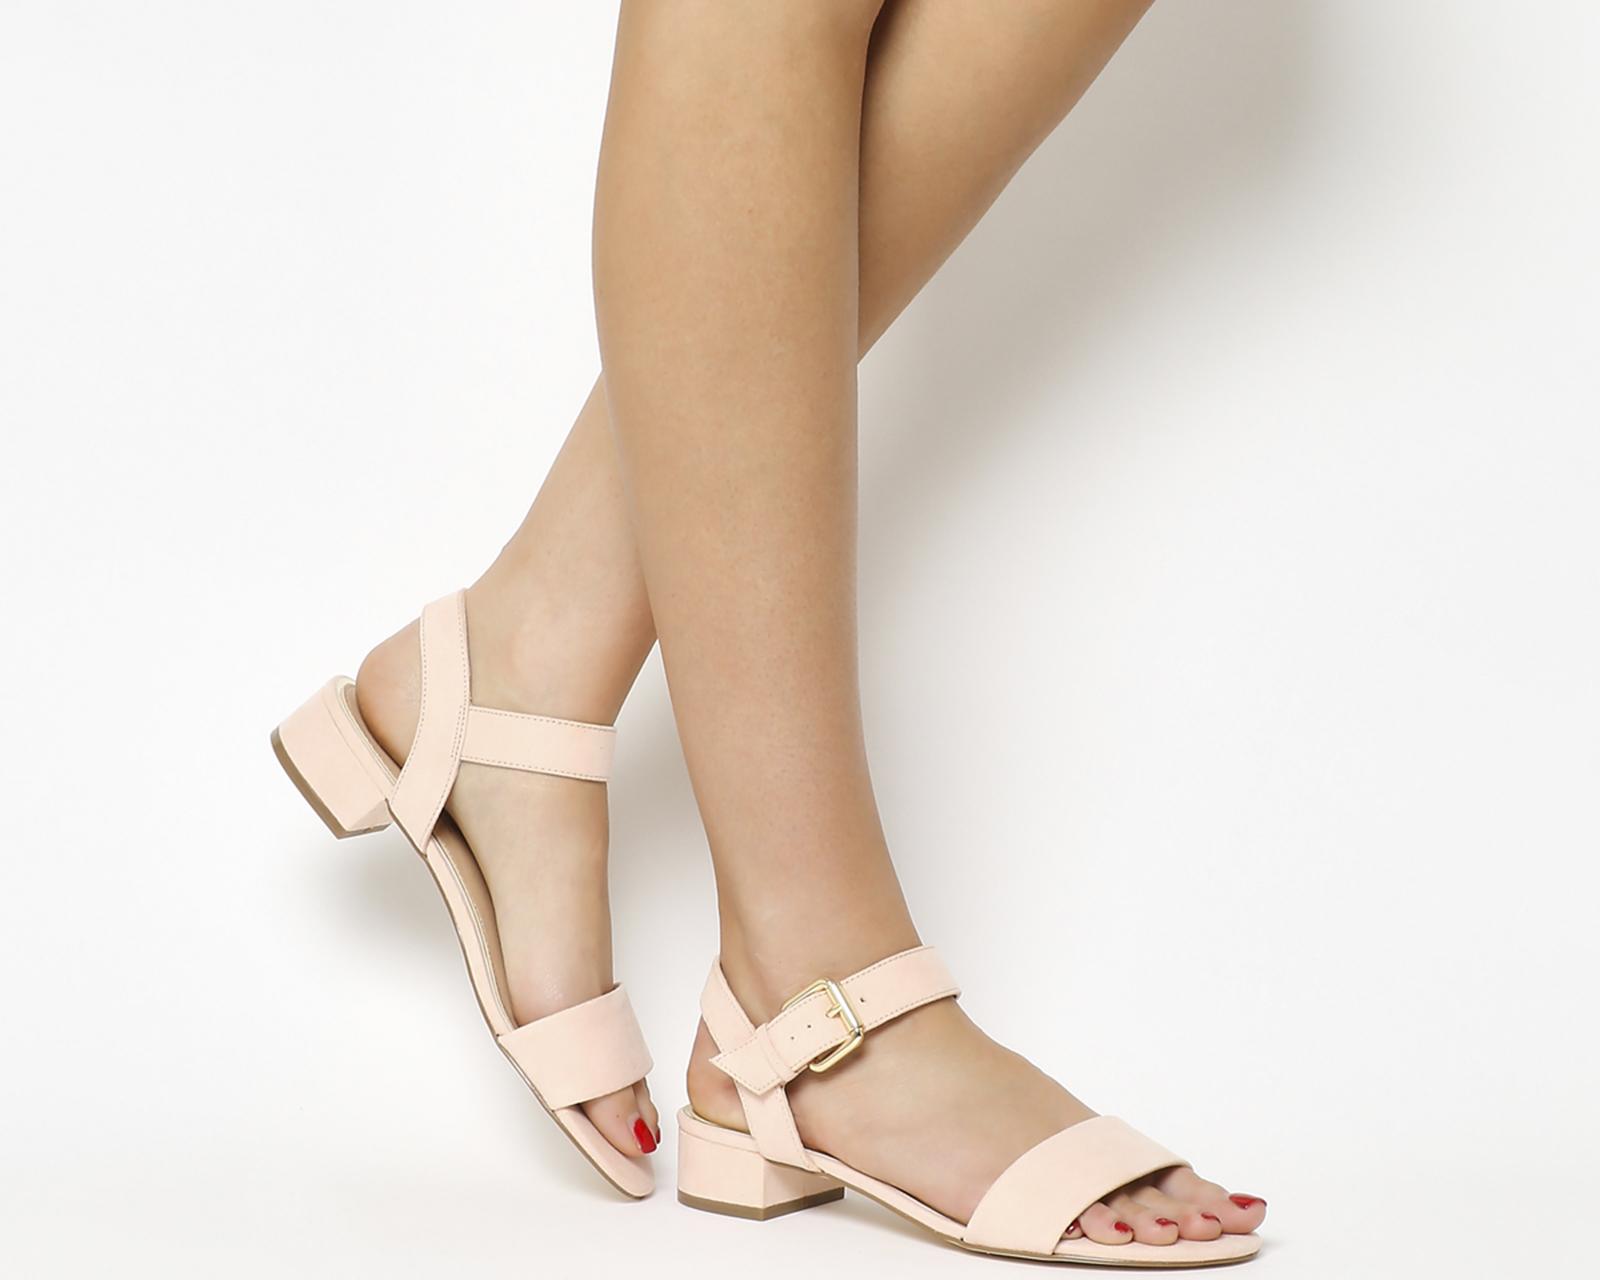 6b528538b96 Sentinel Womens Office Morgan Block Heel Sandals NUDE Heels